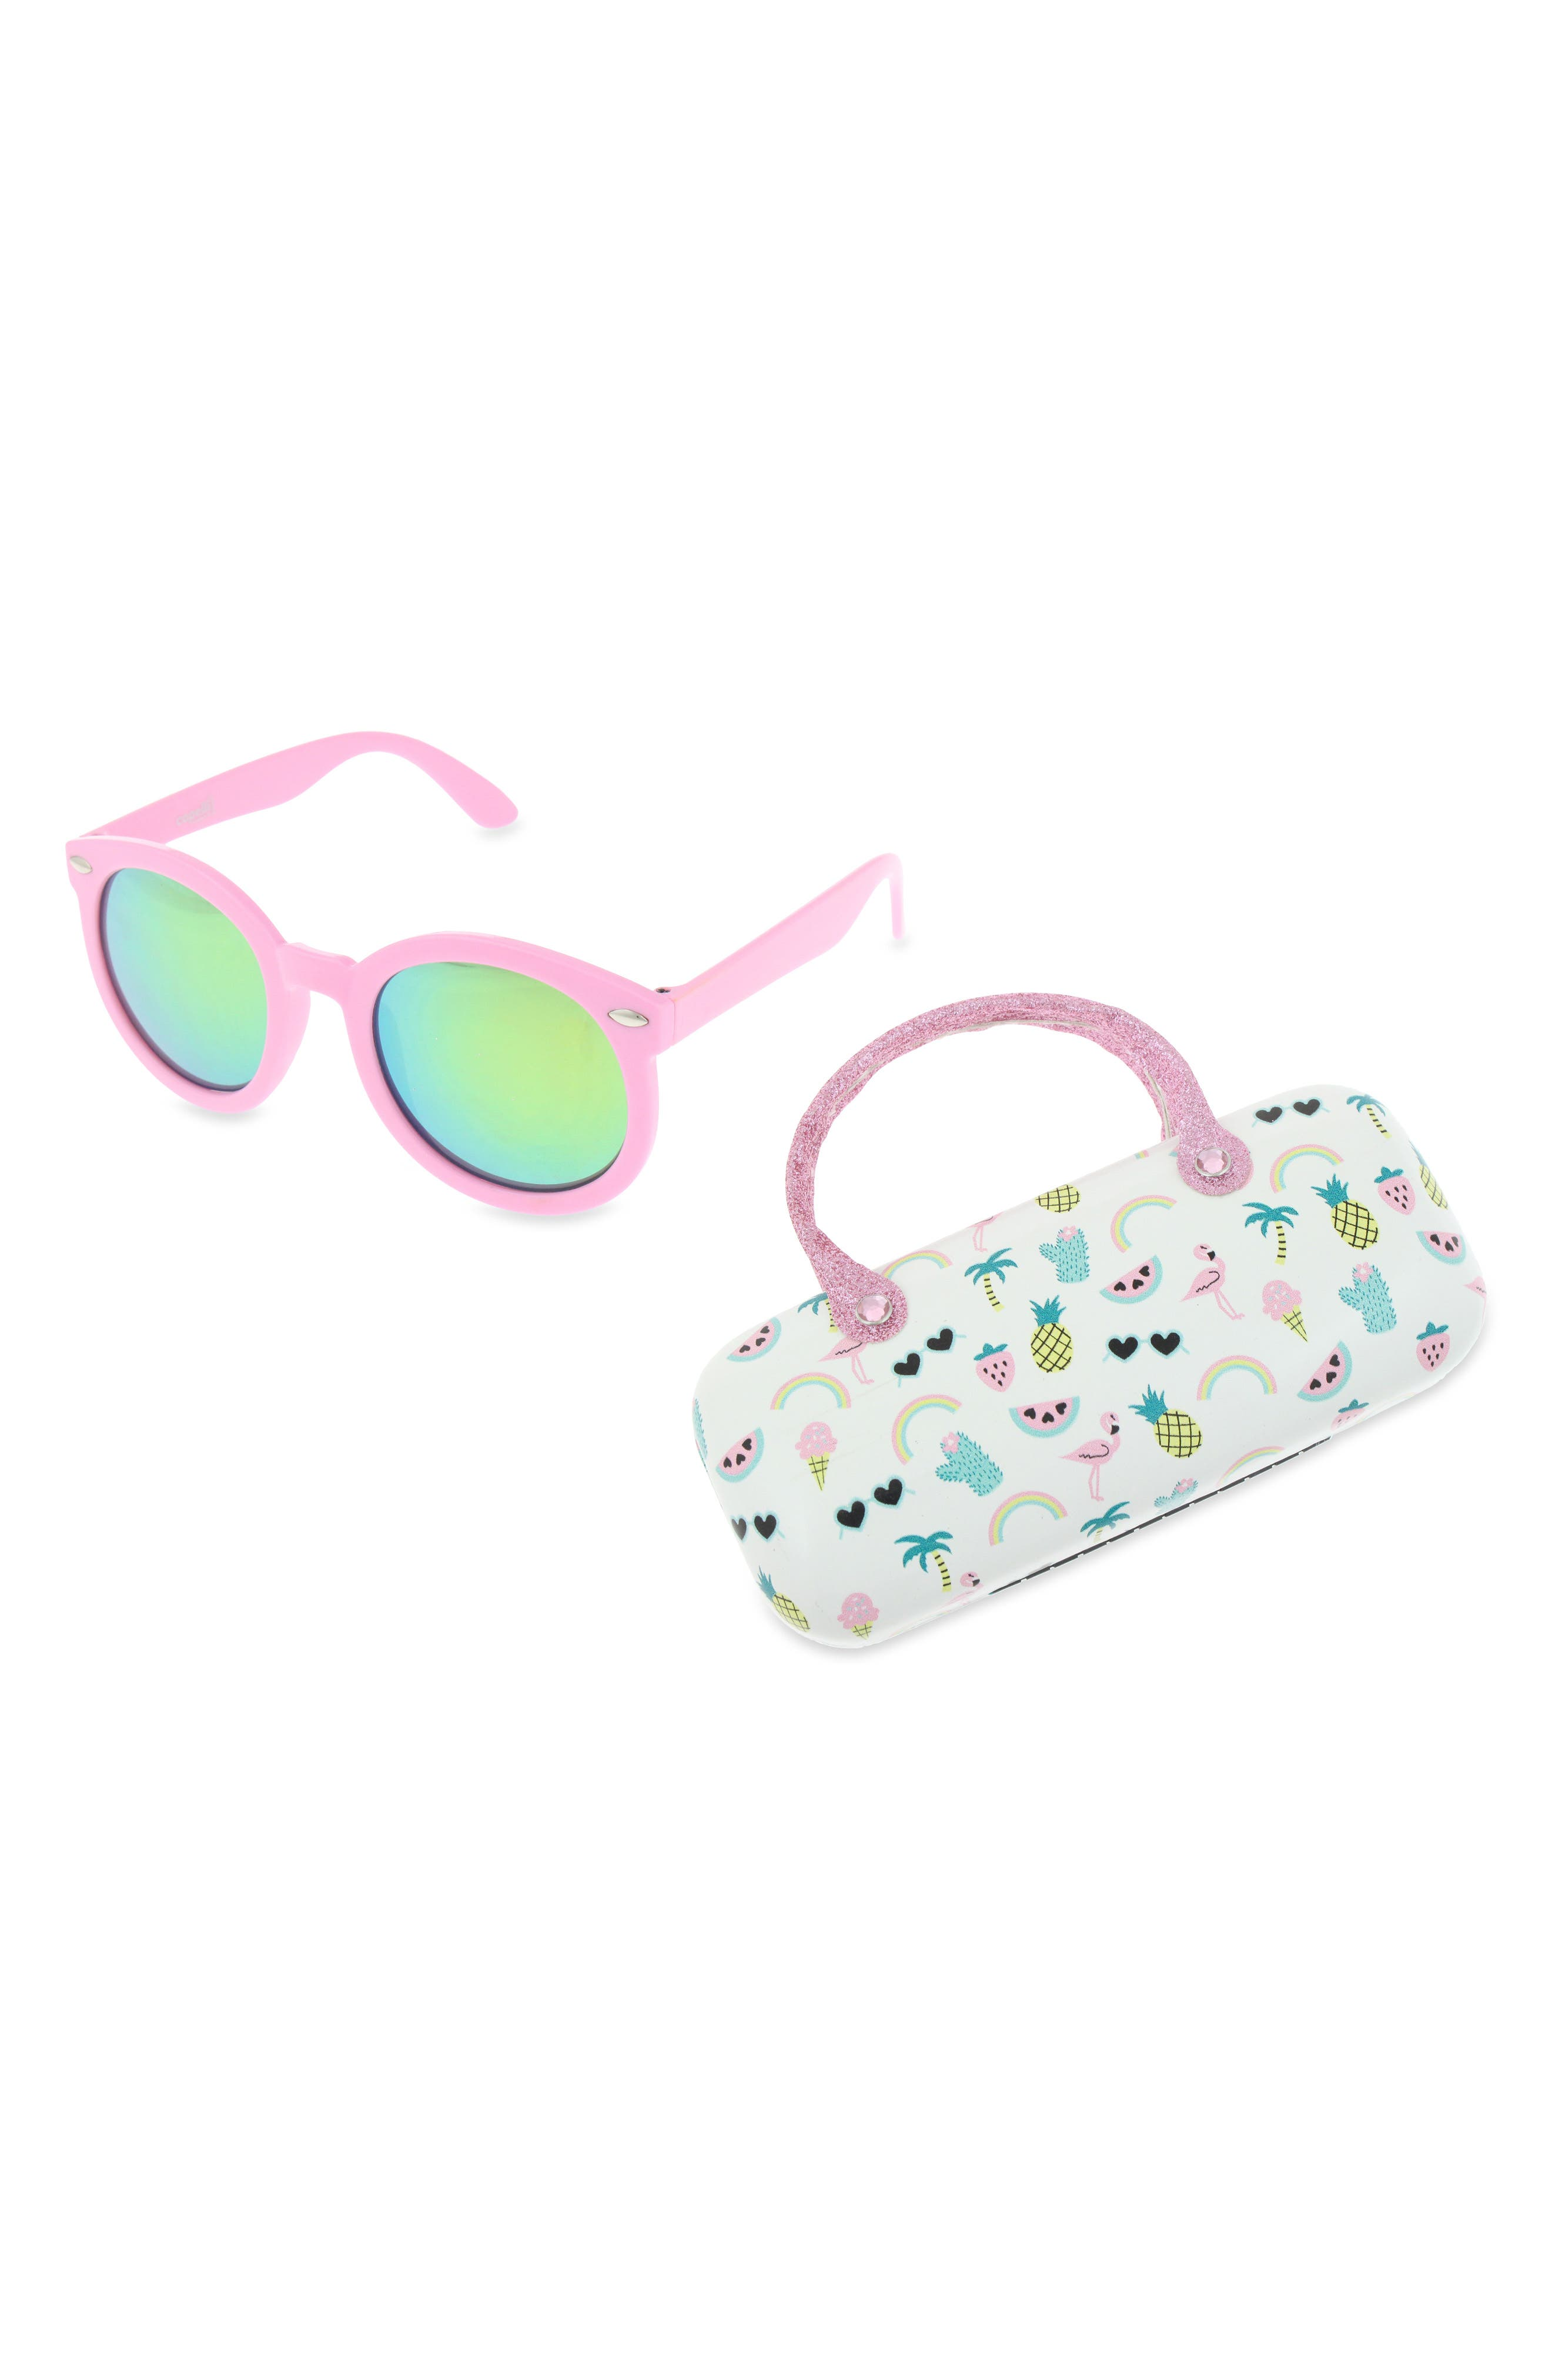 Main Image - Capelli New York Summer Fun 60mm Sunglasses & Case Set (Girls)